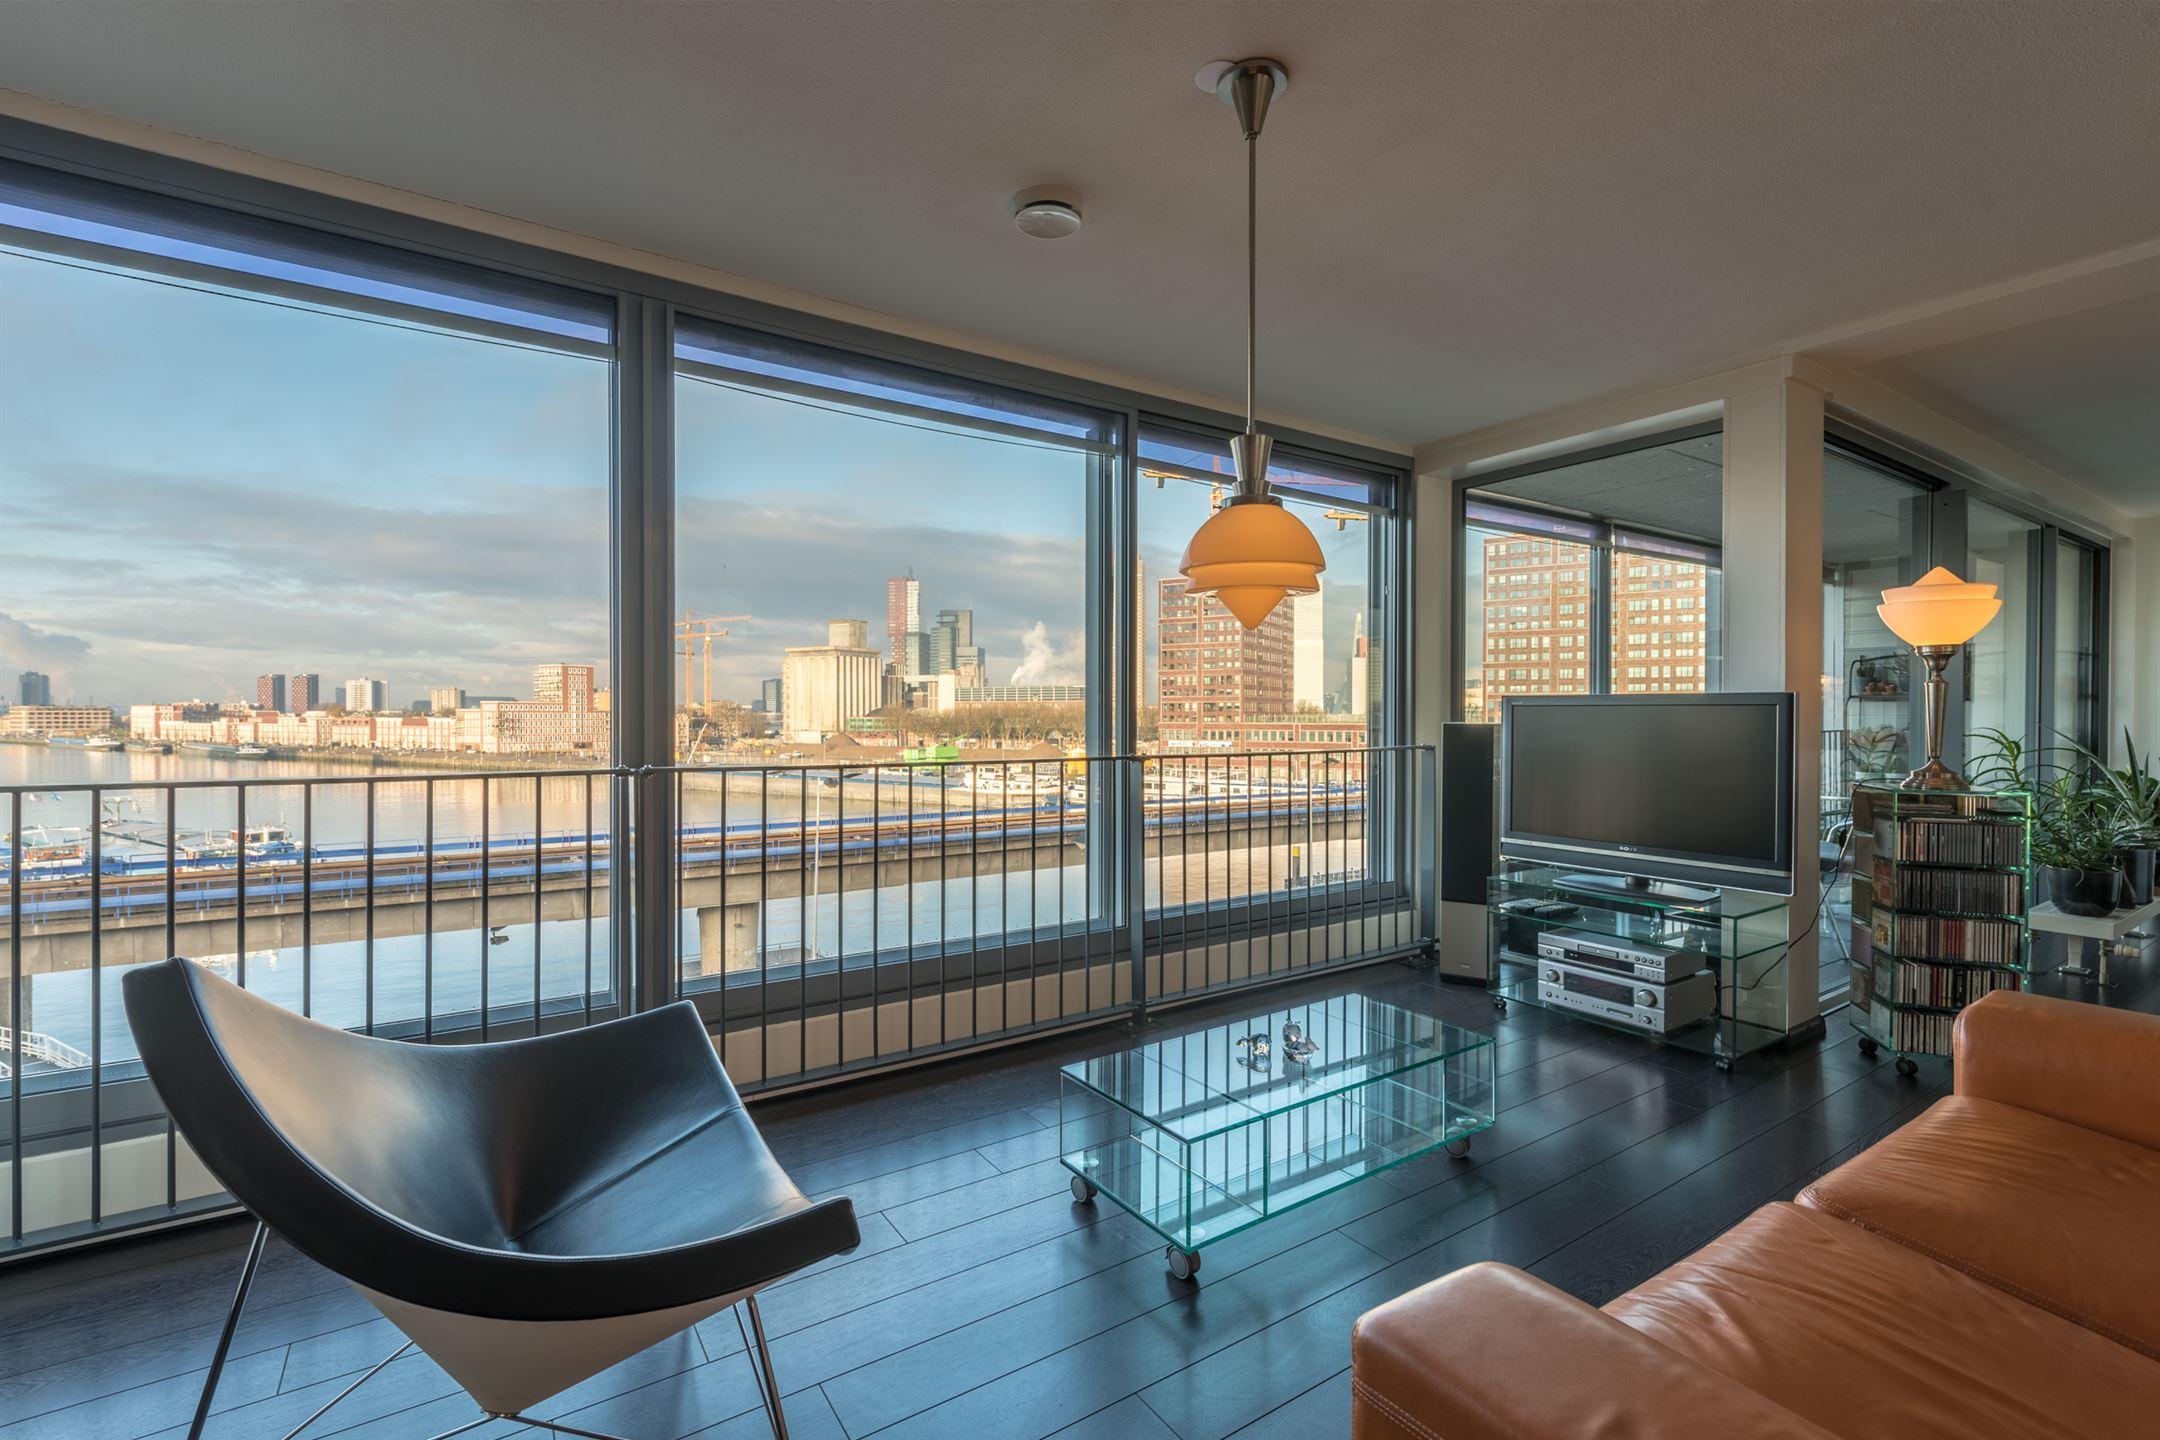 Verkocht maashaven o z 208 3072 hs rotterdam funda for Appartement rotterdam